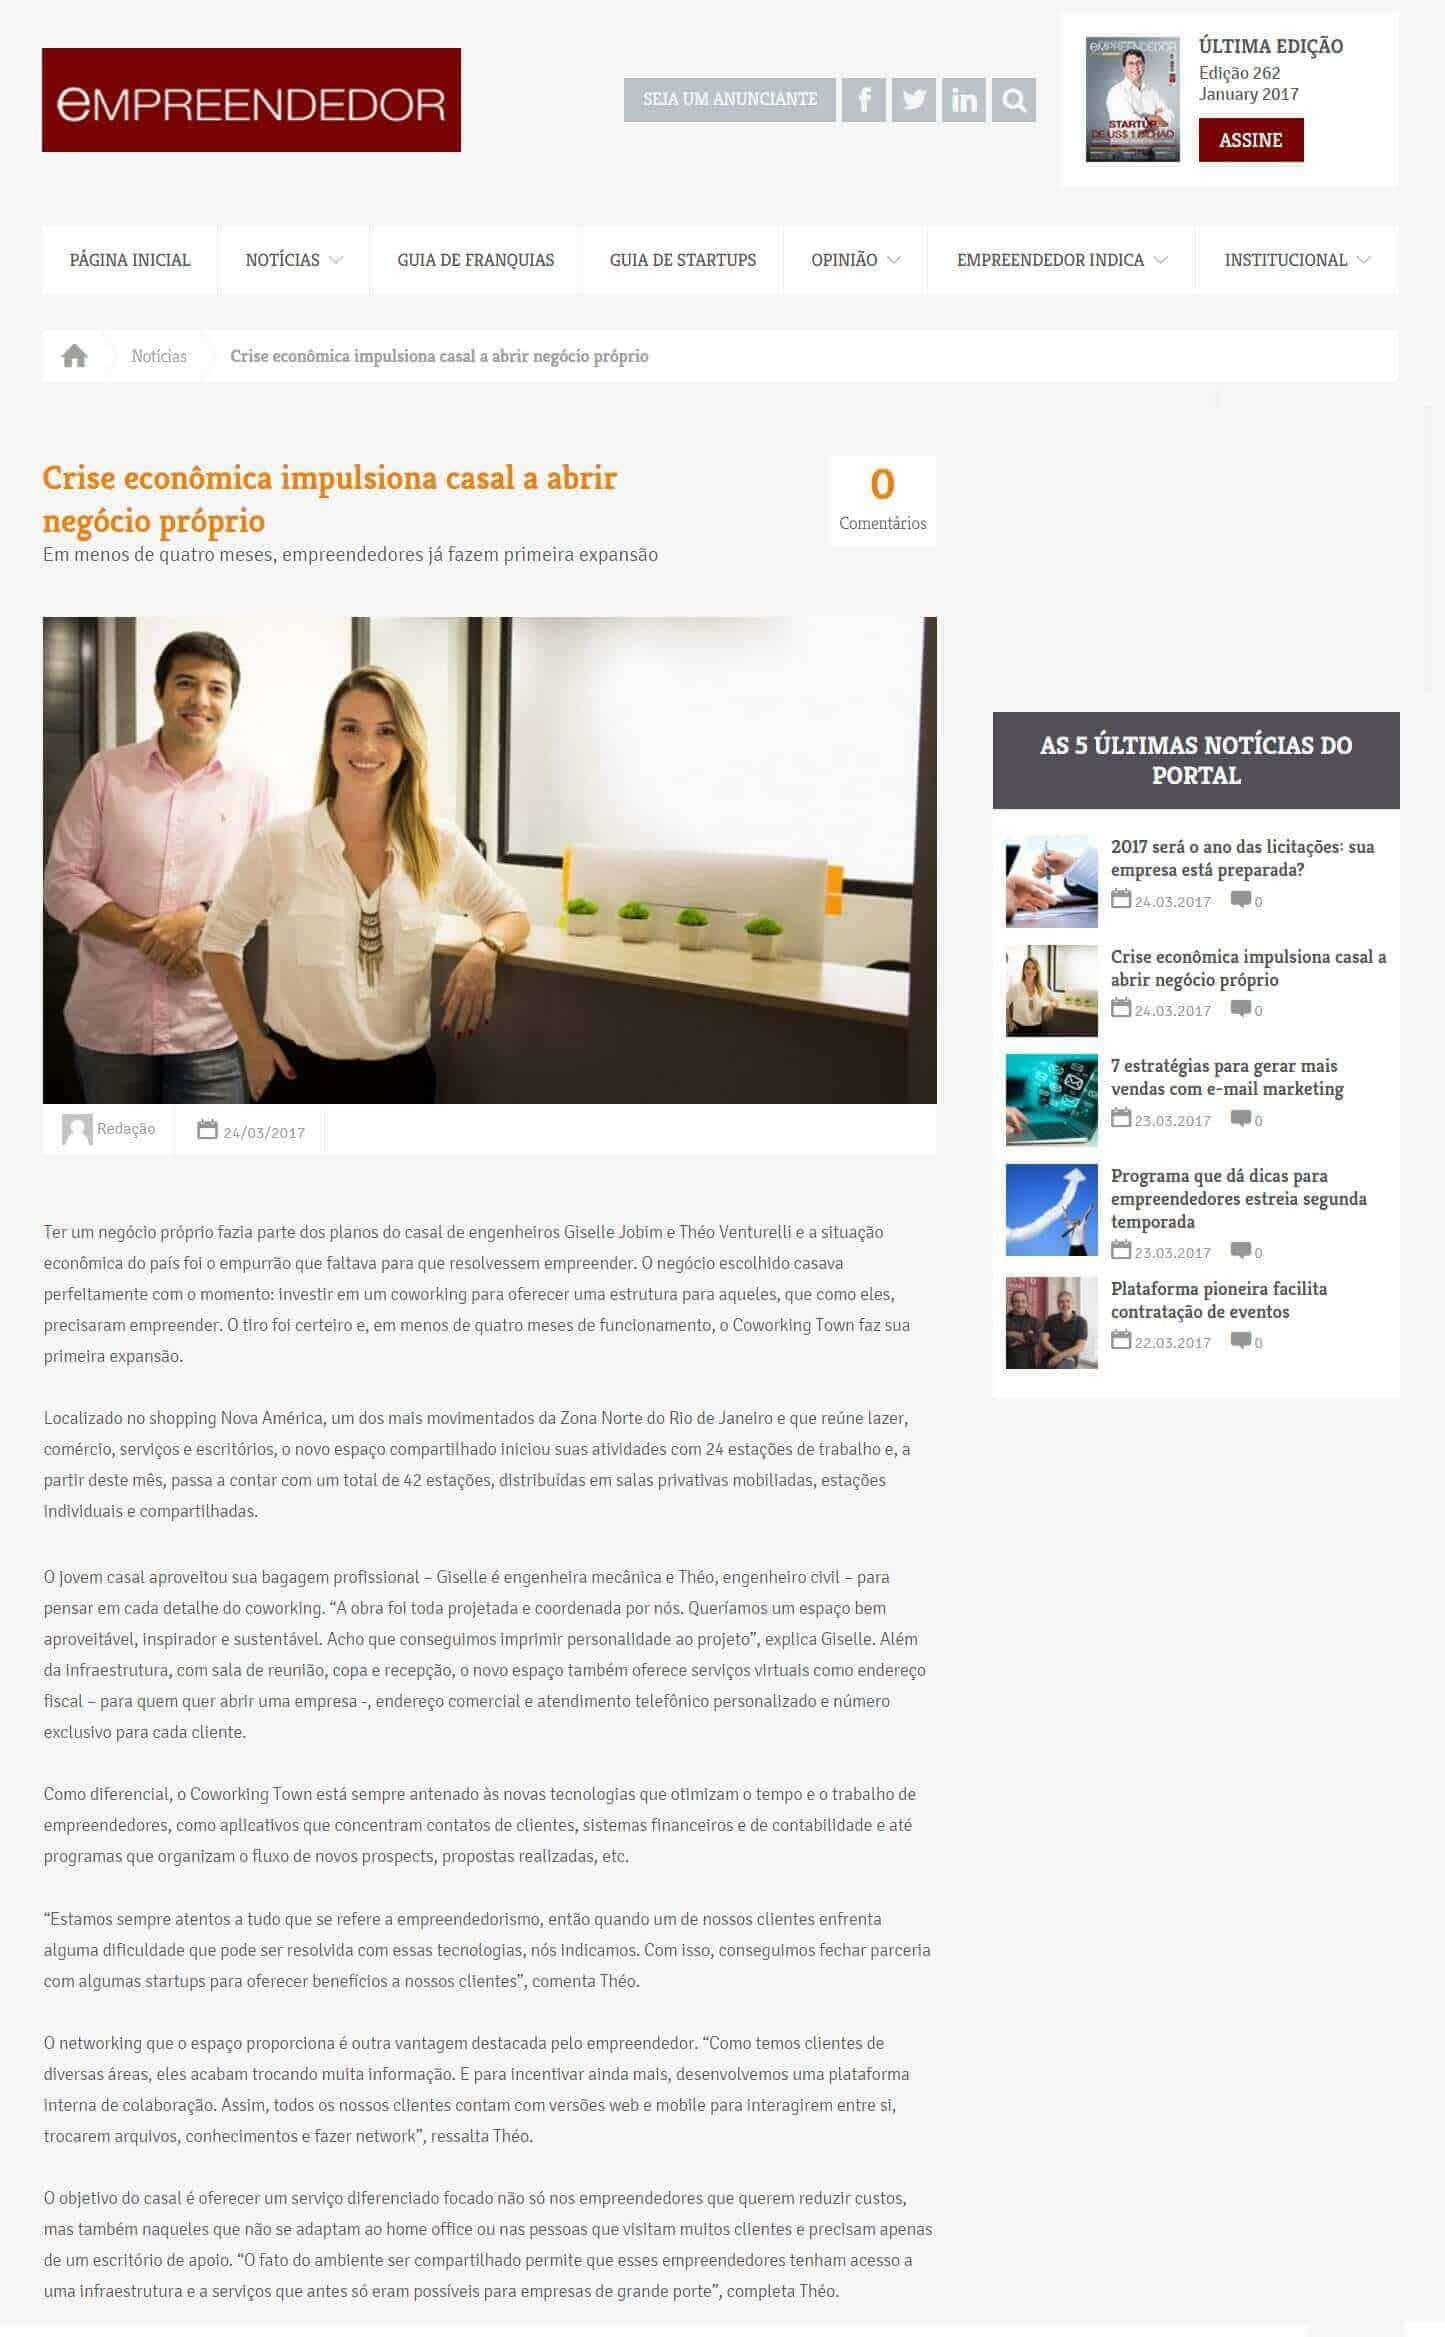 Matéria Sobre o Coworking Town na Revista Empreendedor